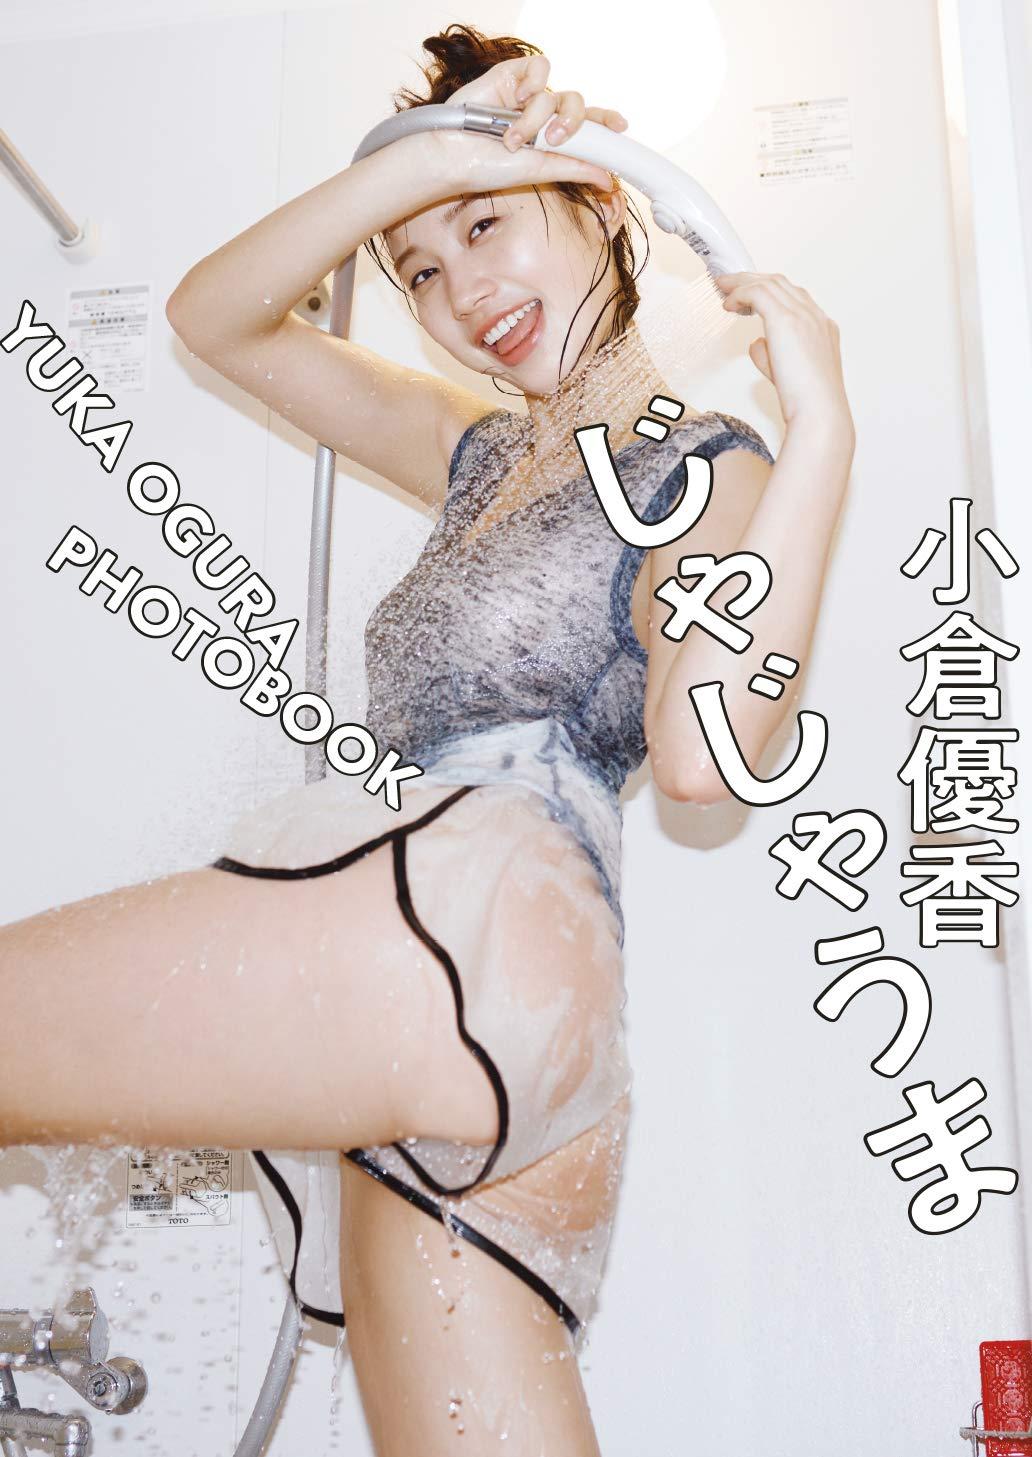 Gカップグラドル 小倉優香 Ogura Yuka さん 動画と画像の作品リスト